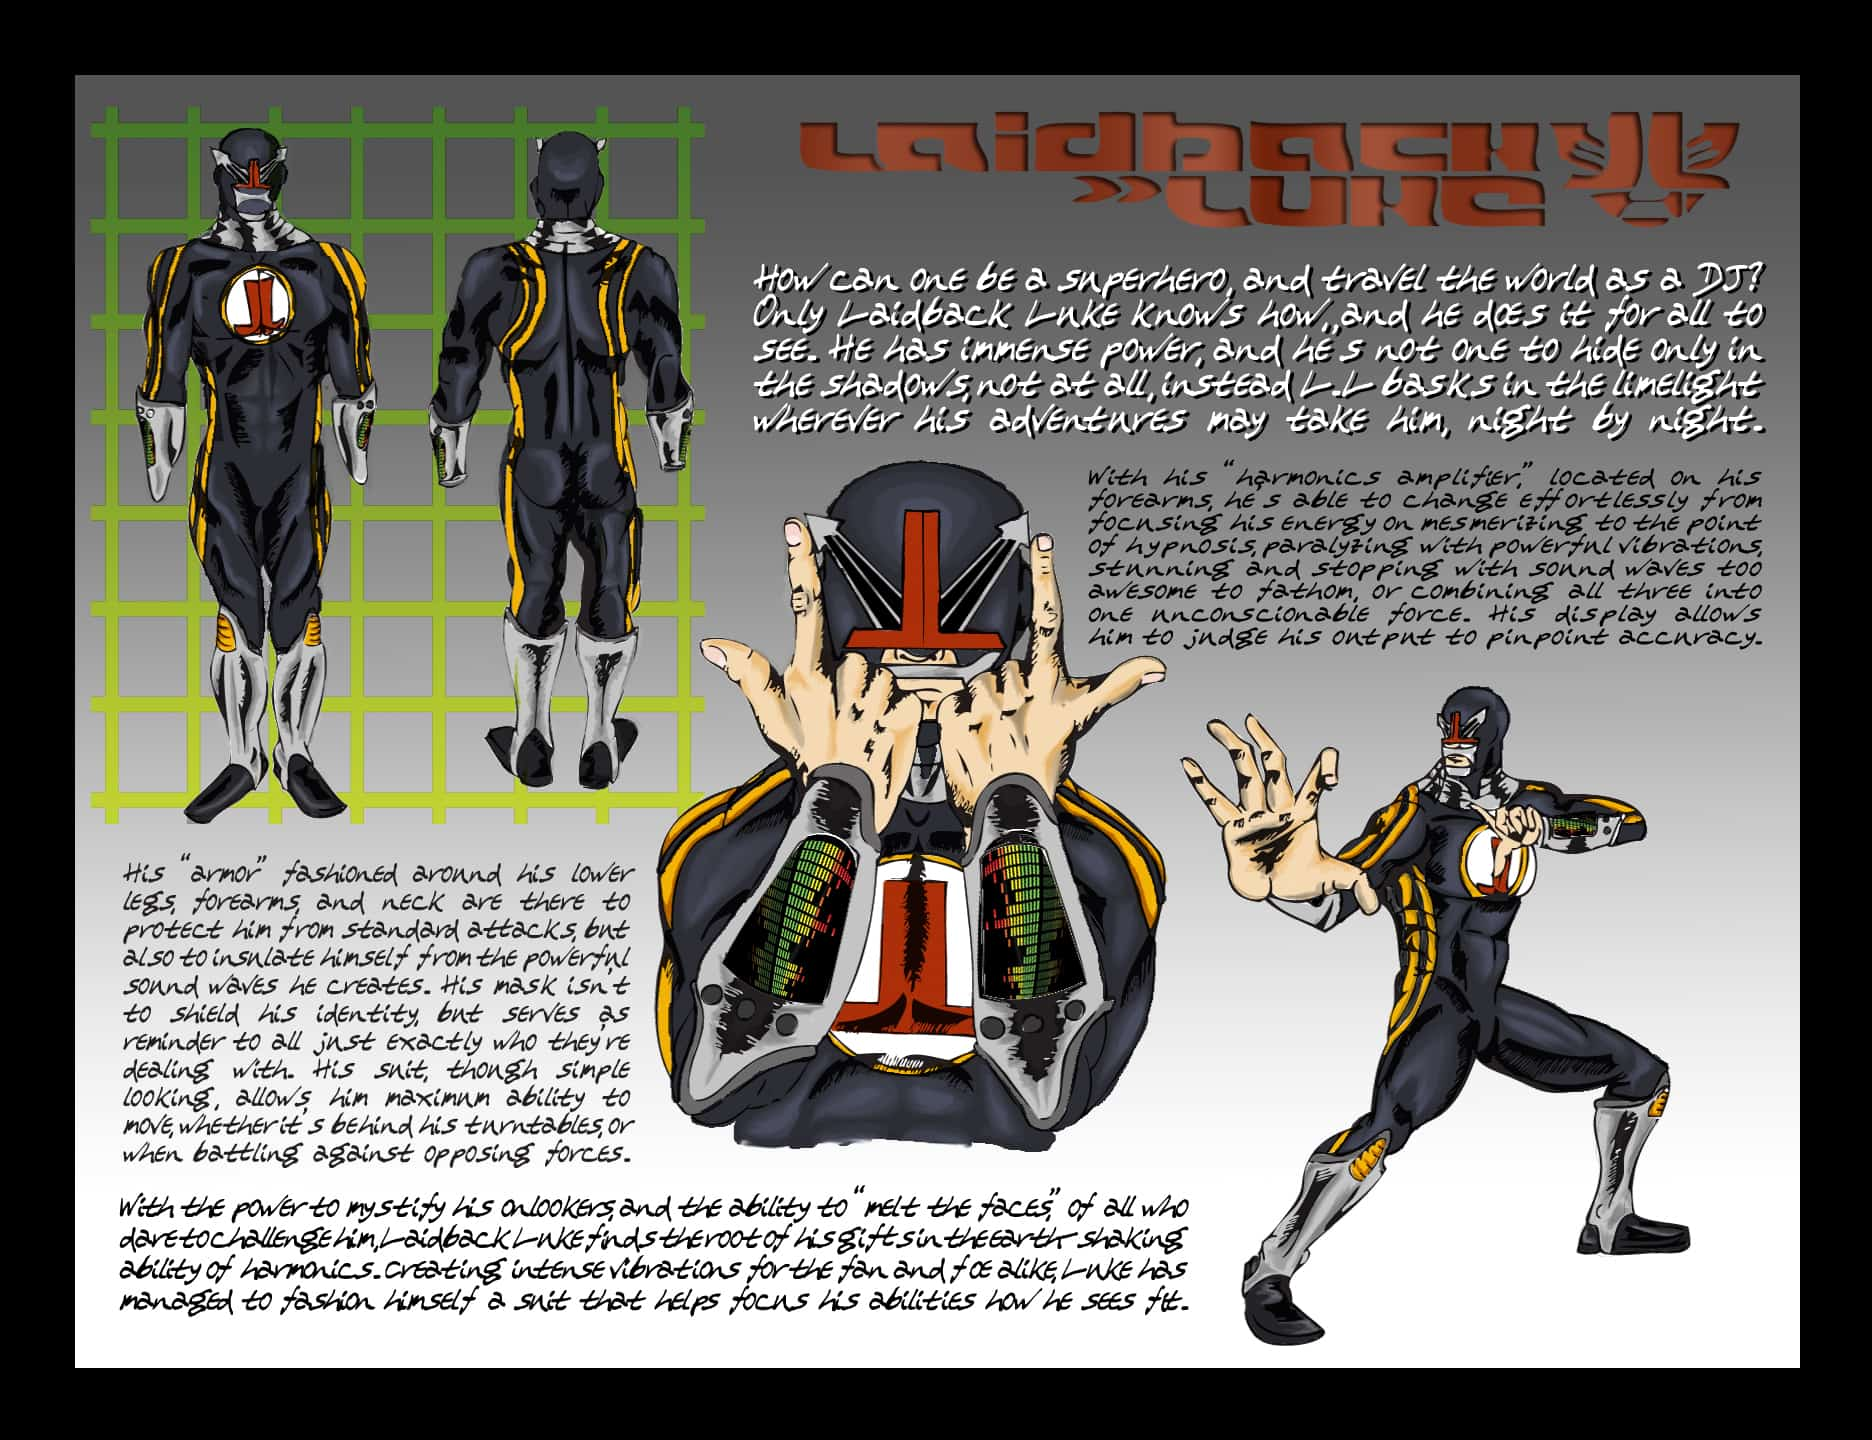 Laidback Luke Costume Design Estevan Bellino